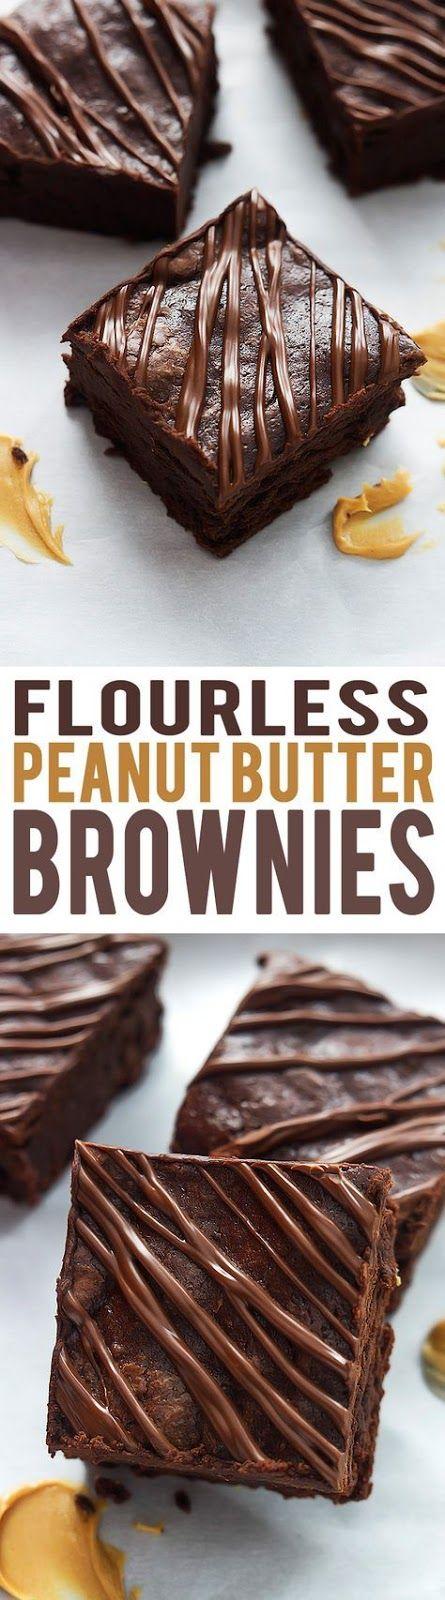 FLOURLESS FUDGEY PEANUT BUTTER BROWNIES | Cake And Food Recipe